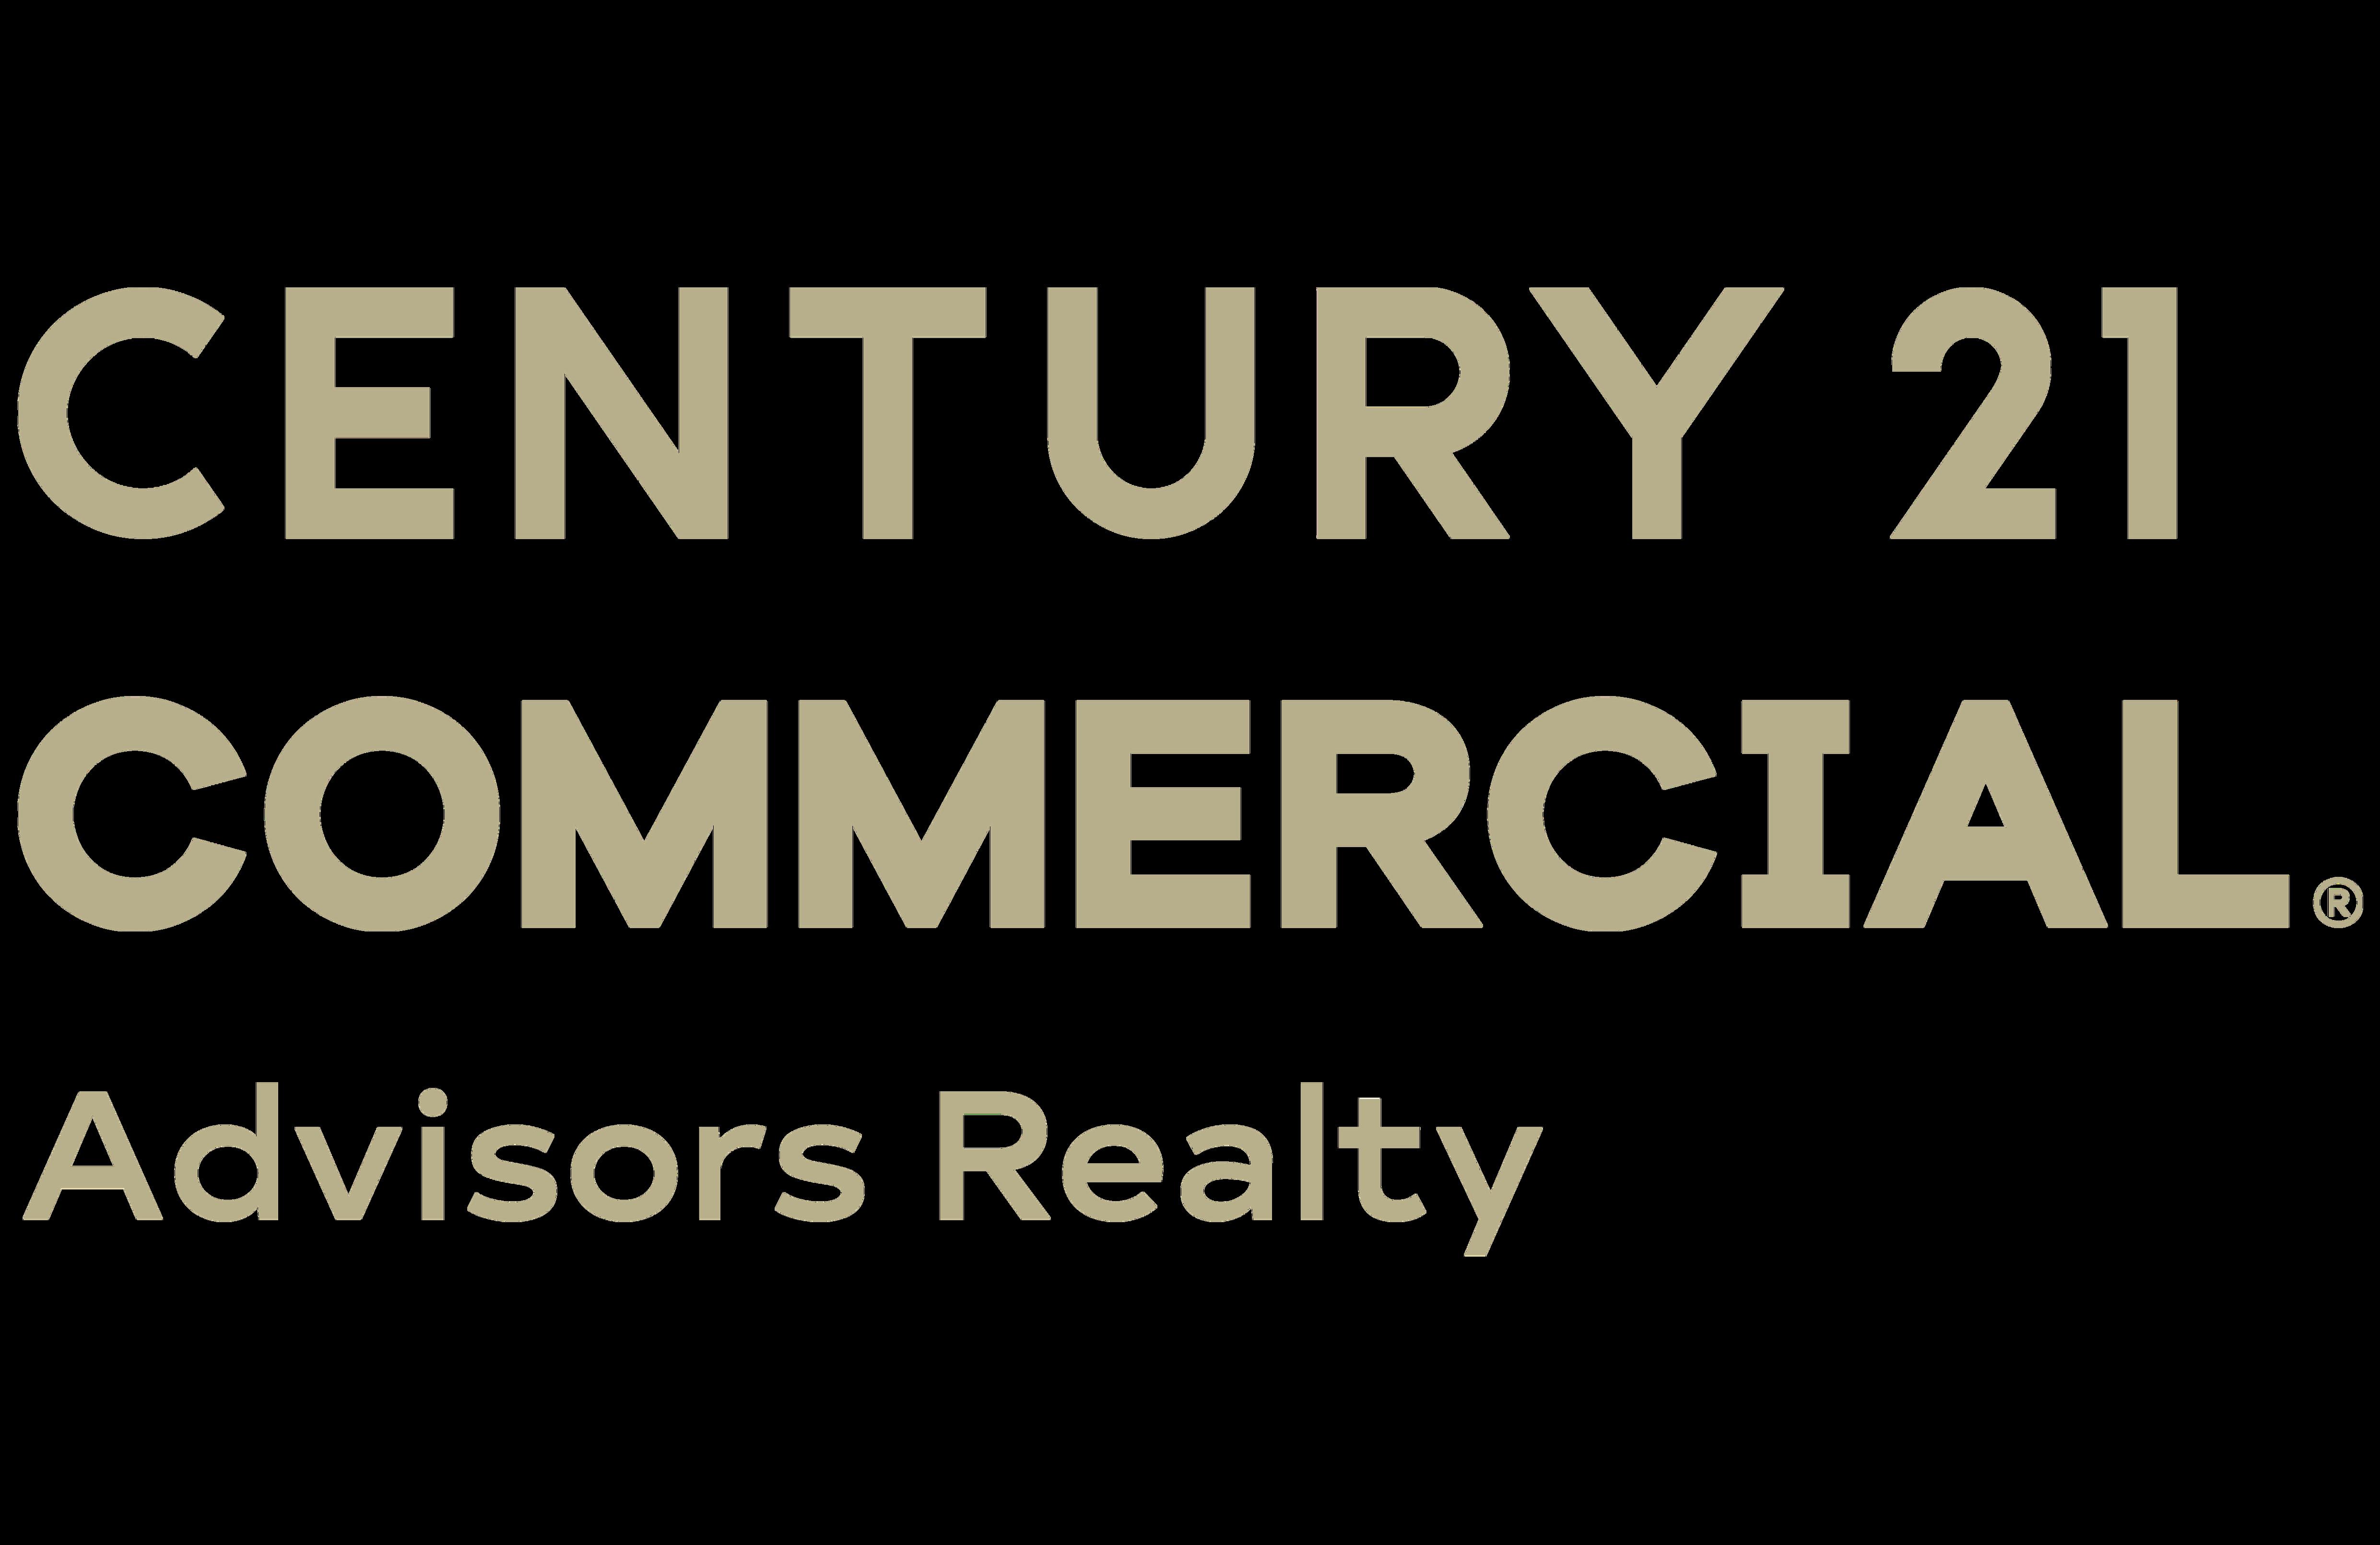 CENTURY 21 Advisors Realty